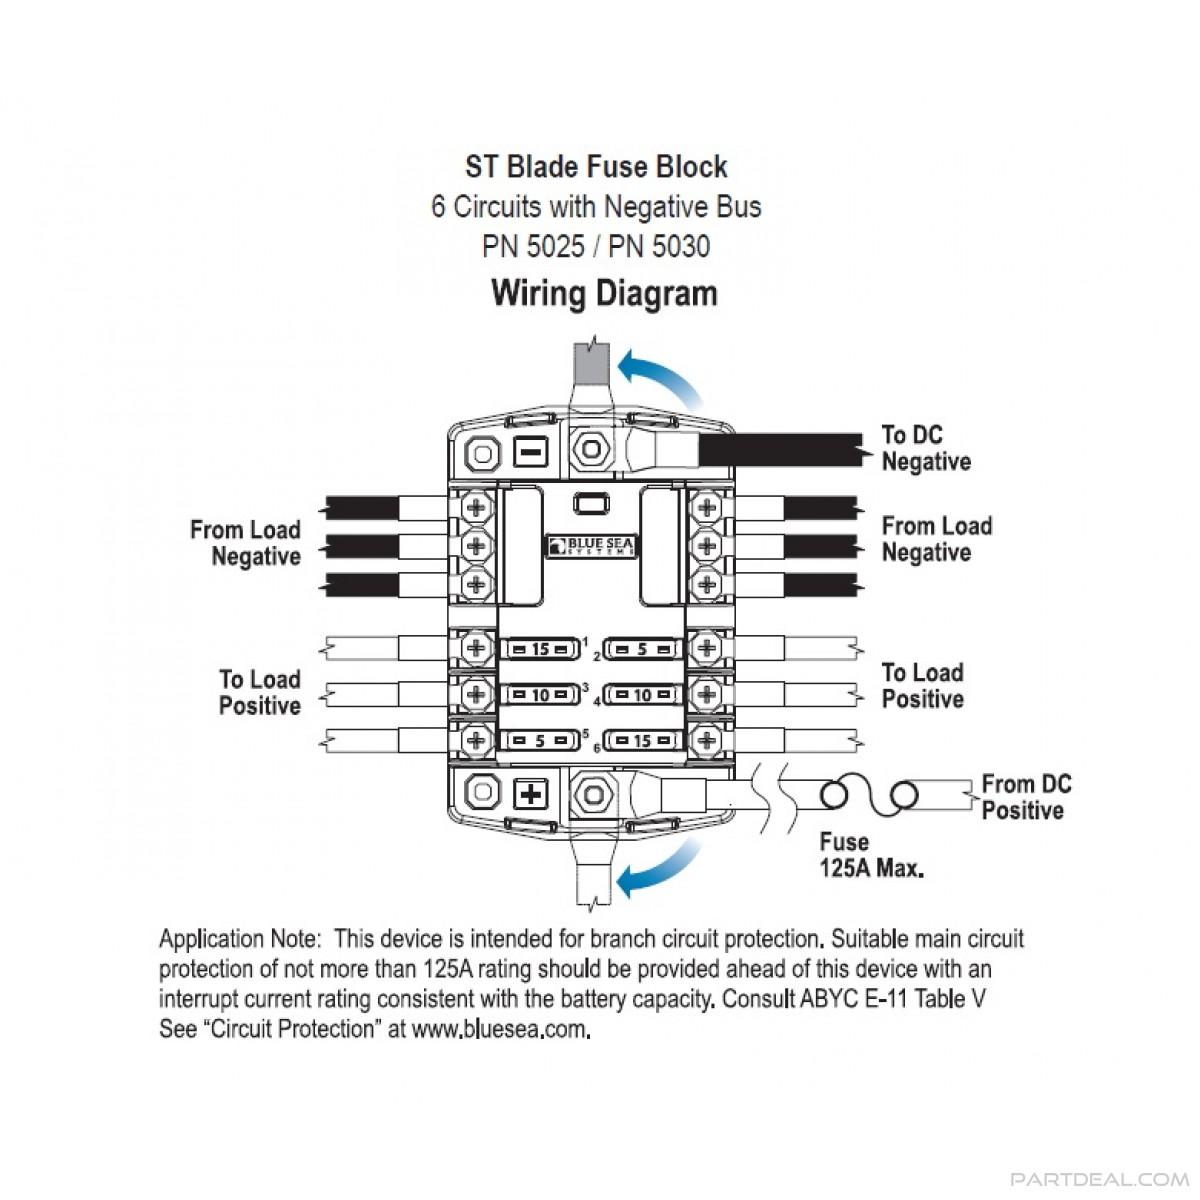 blue sea wiring diagram dc fuse block wiring diagram blog wiring diagram blue sea 5511e wiring diagram dc fuse block wiring diagram blog